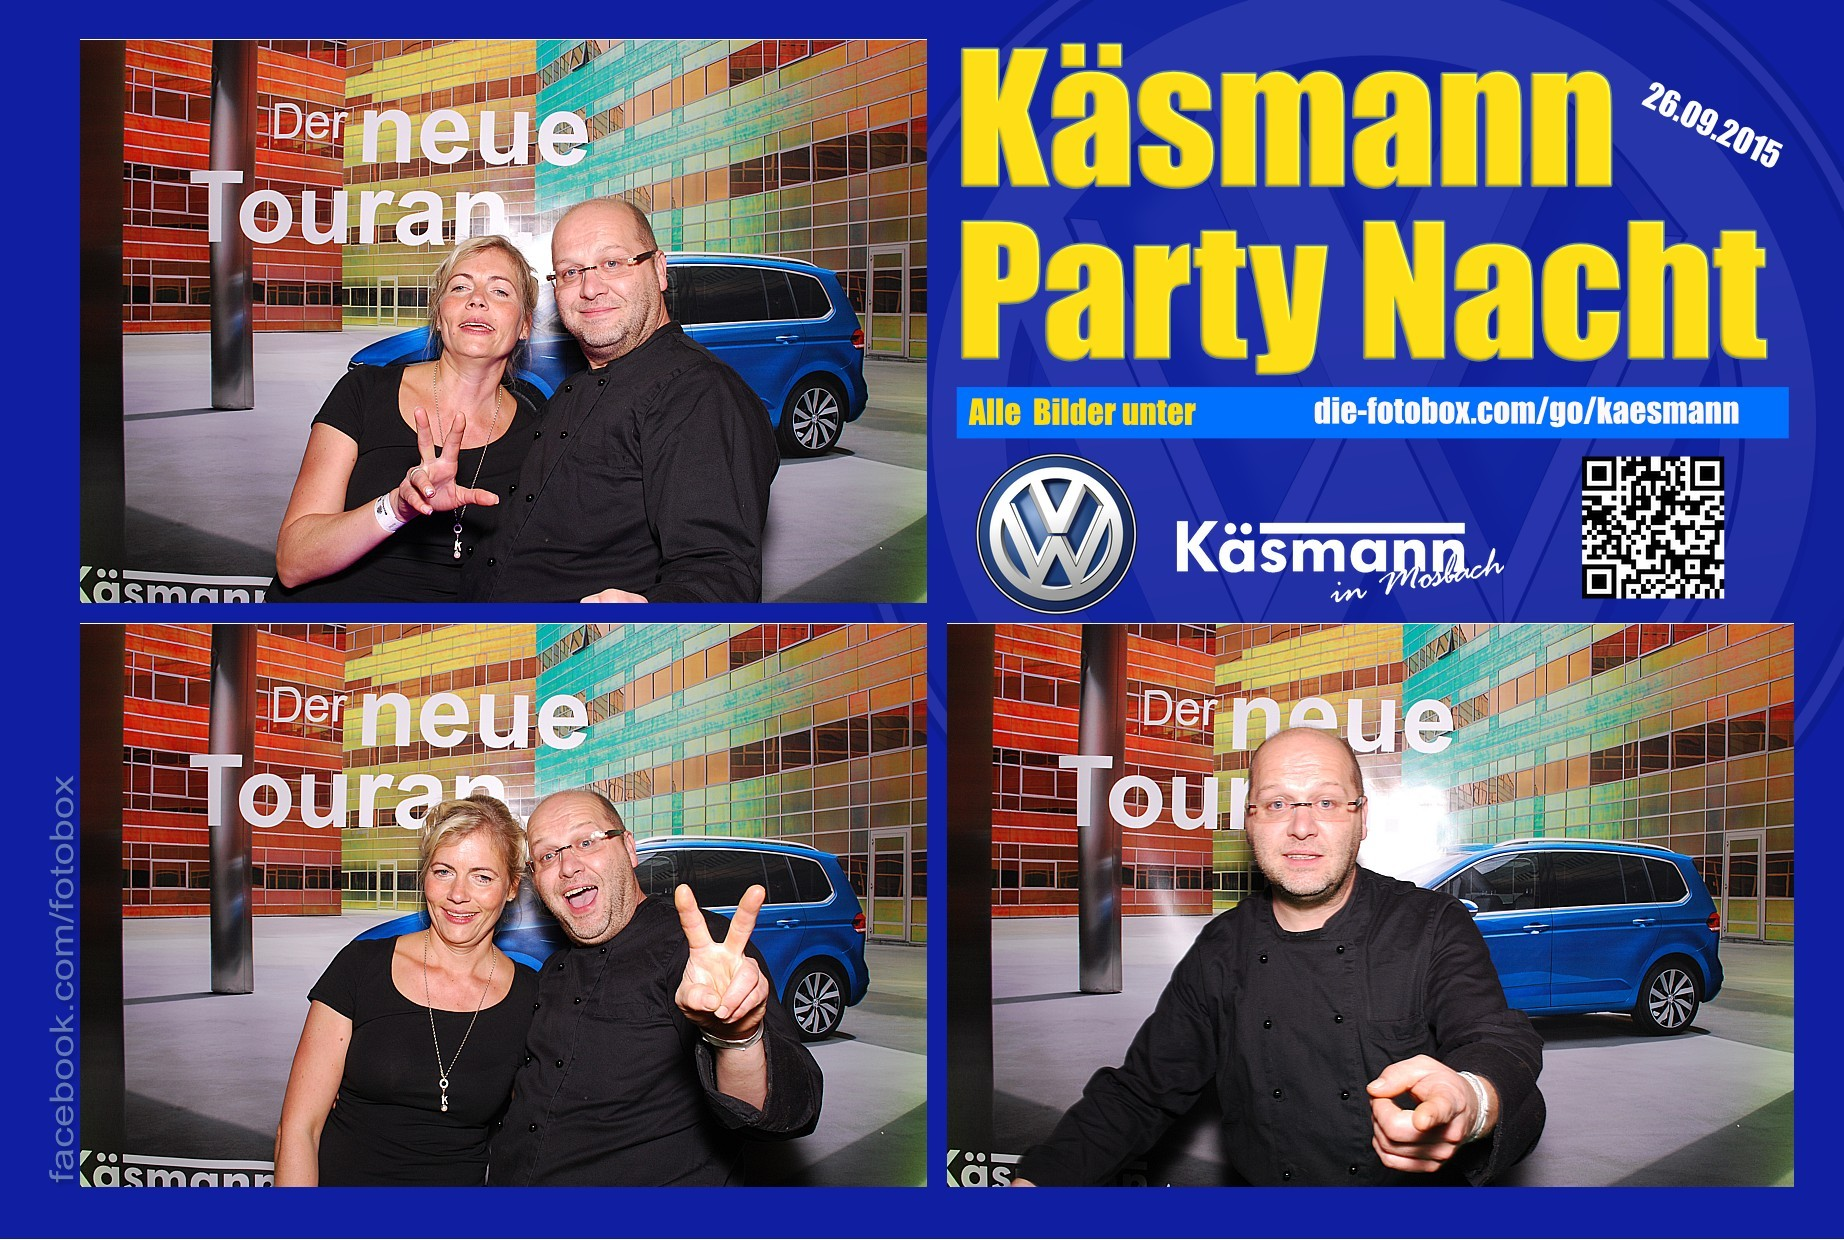 Käsmannparty 2015 - www.die-fotobox.com 01328